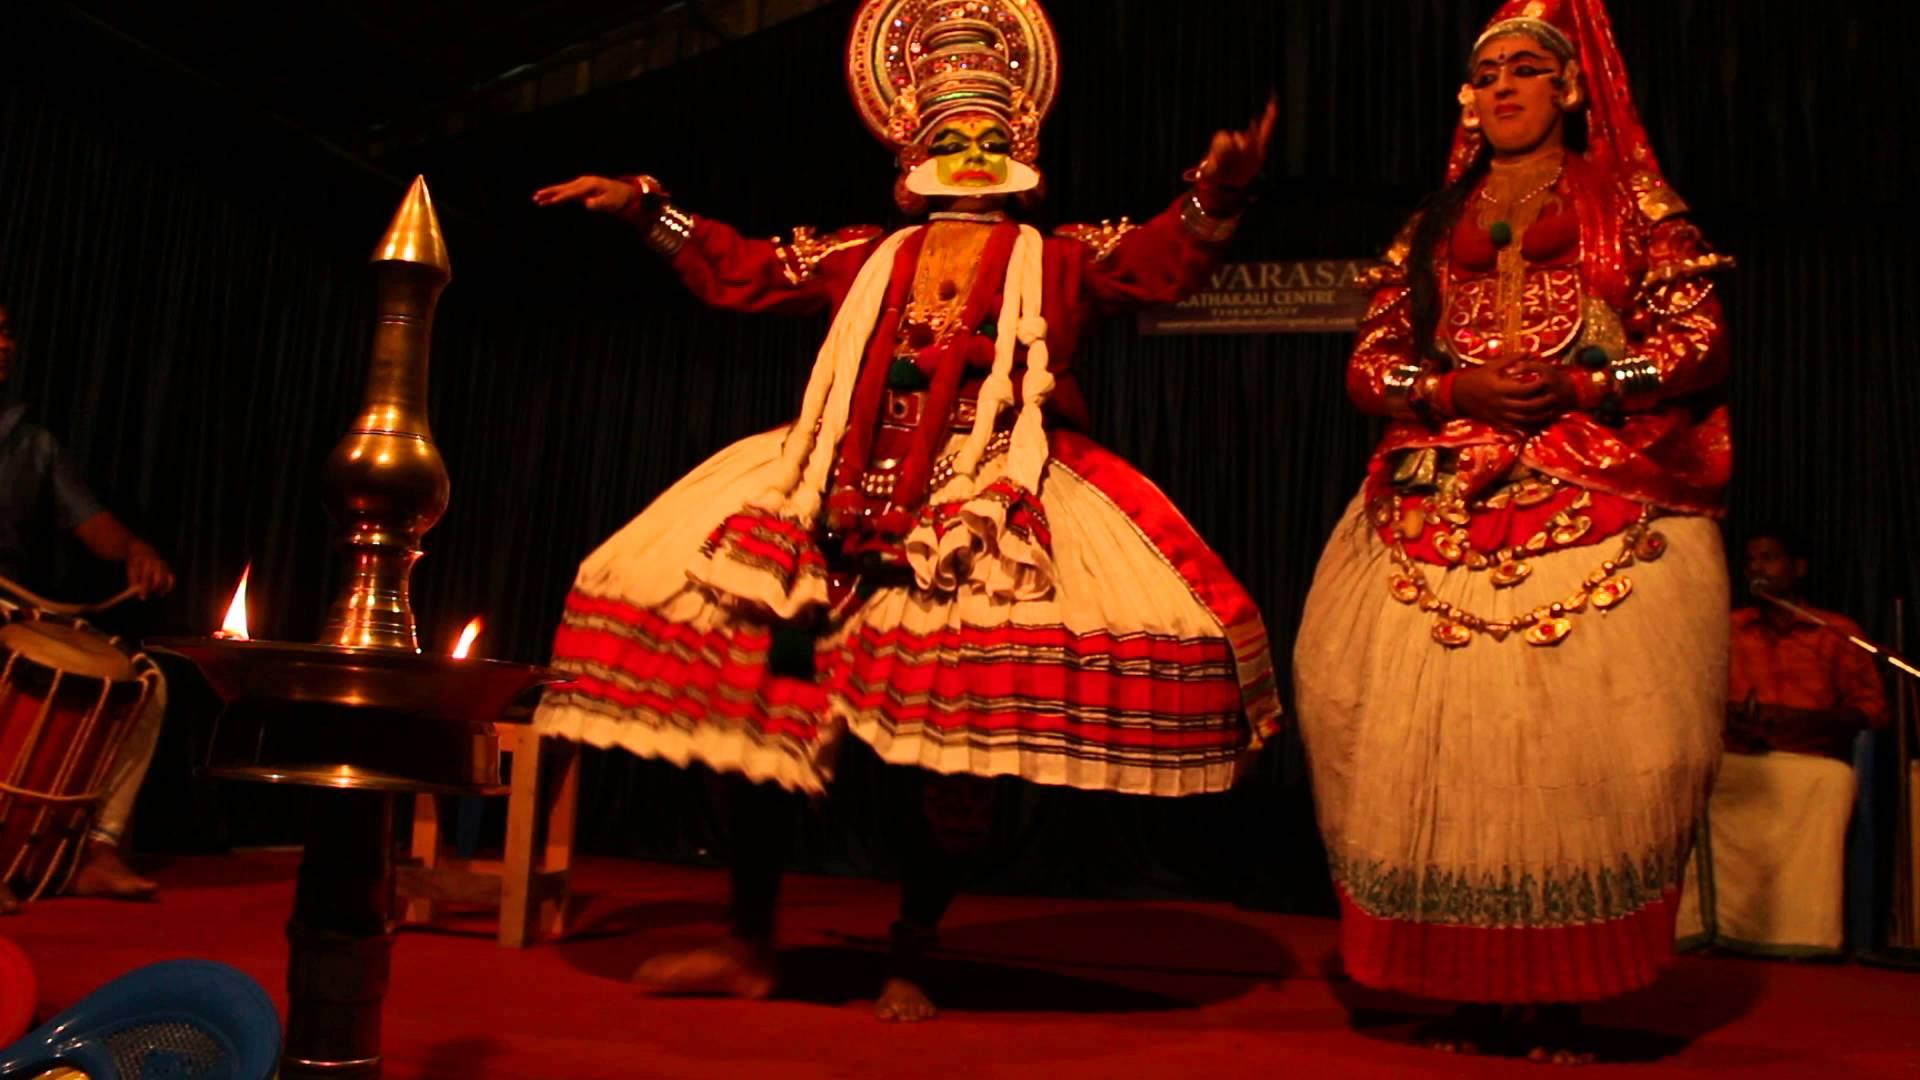 Disfrute de una danza de Kathakali